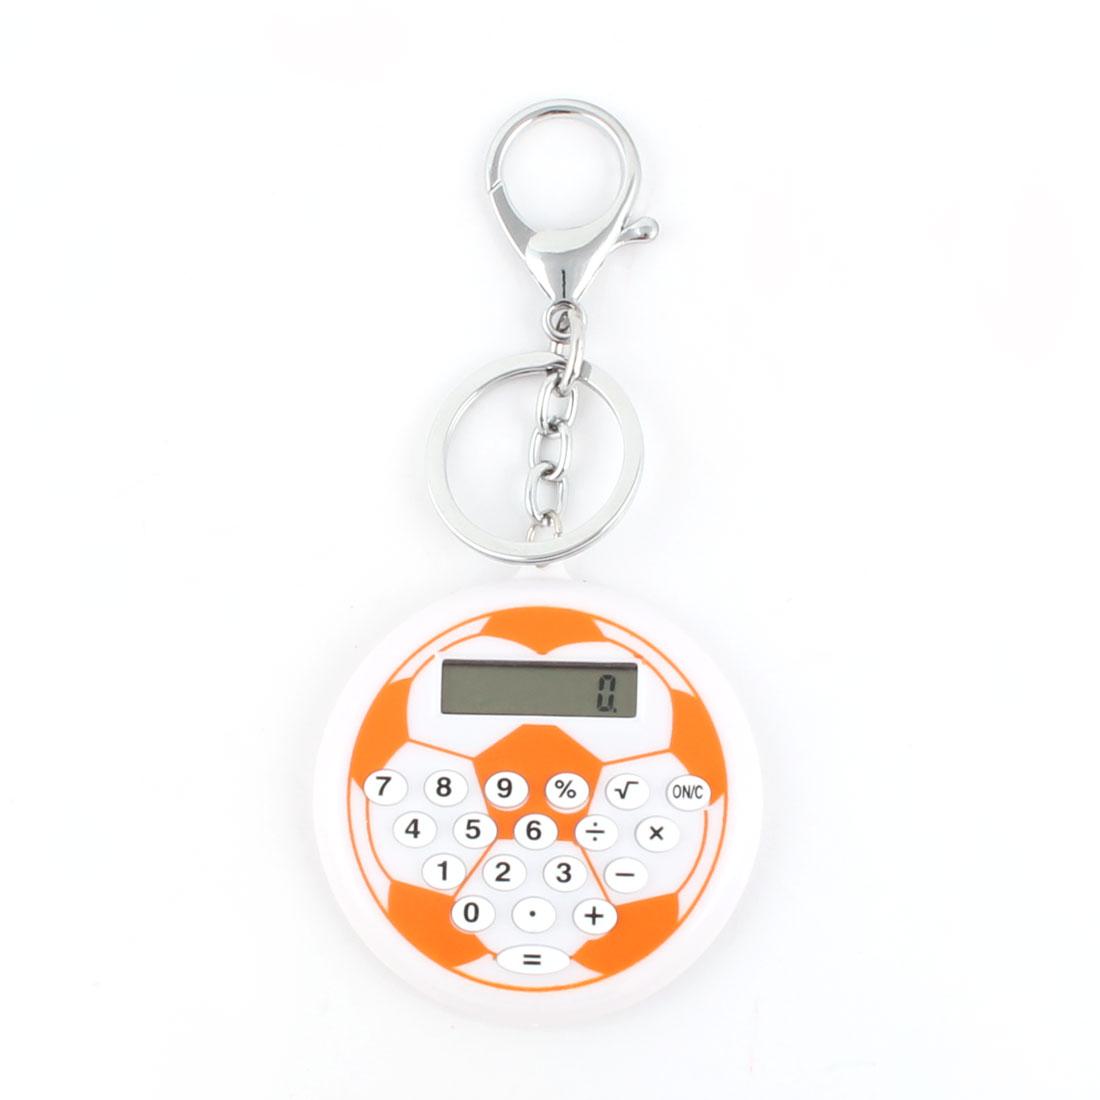 LCD Display Soccer Ball Pattern 8 Digit Pocket Portable Key Chain Calculator Orange